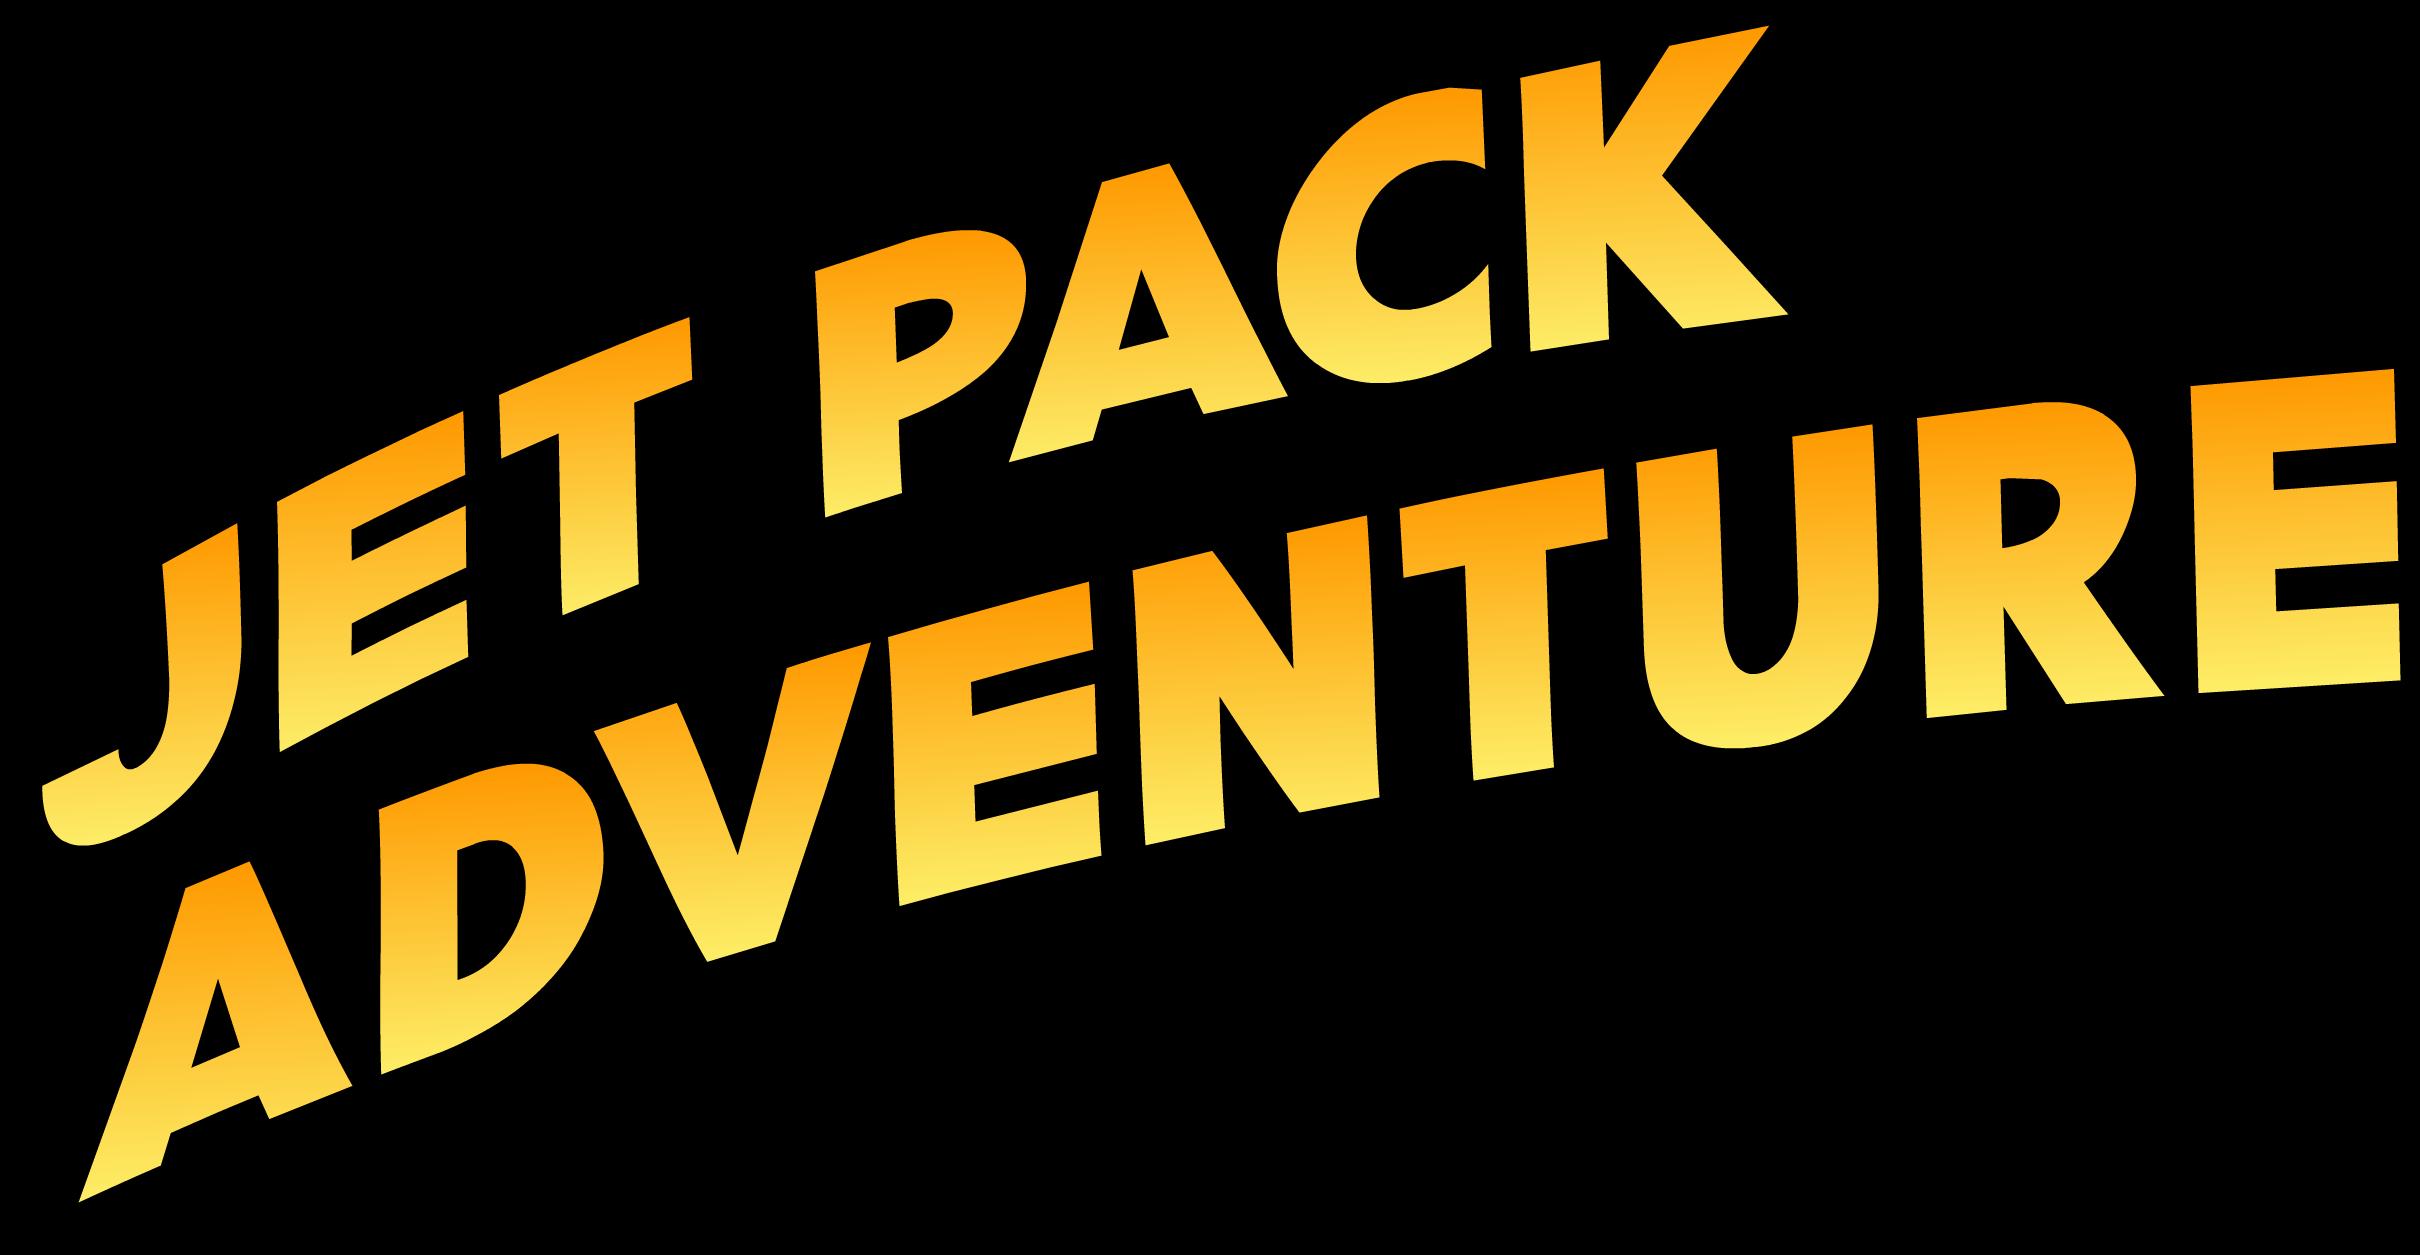 Jet Pack Adventure